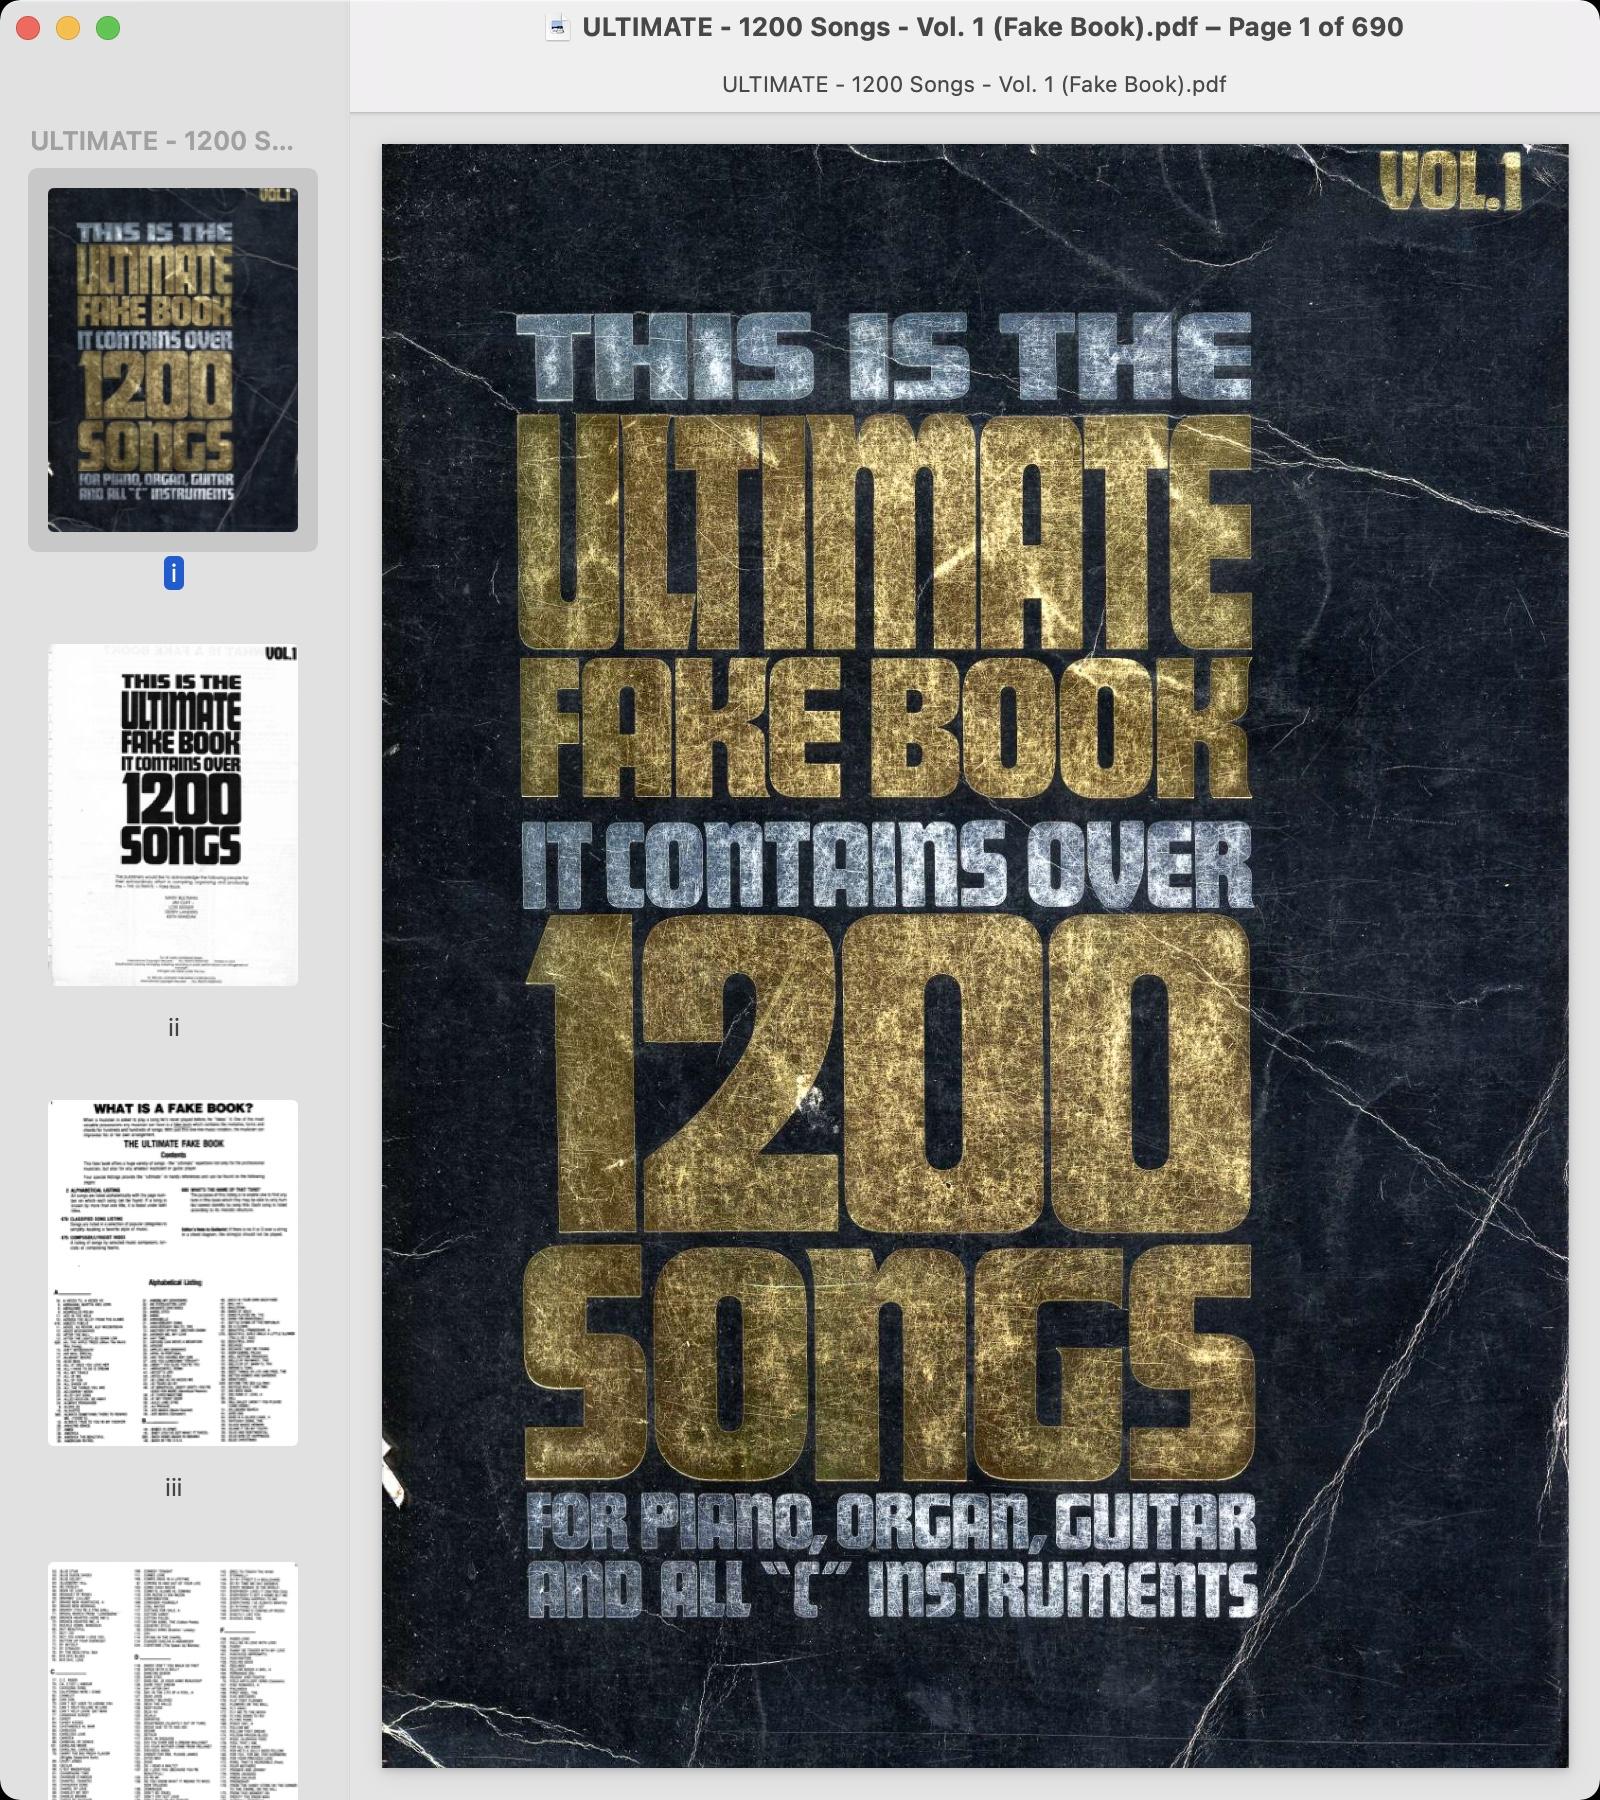 ULTIMATE - 1200 Songs - Vol. 1 (Fake Book).jpg